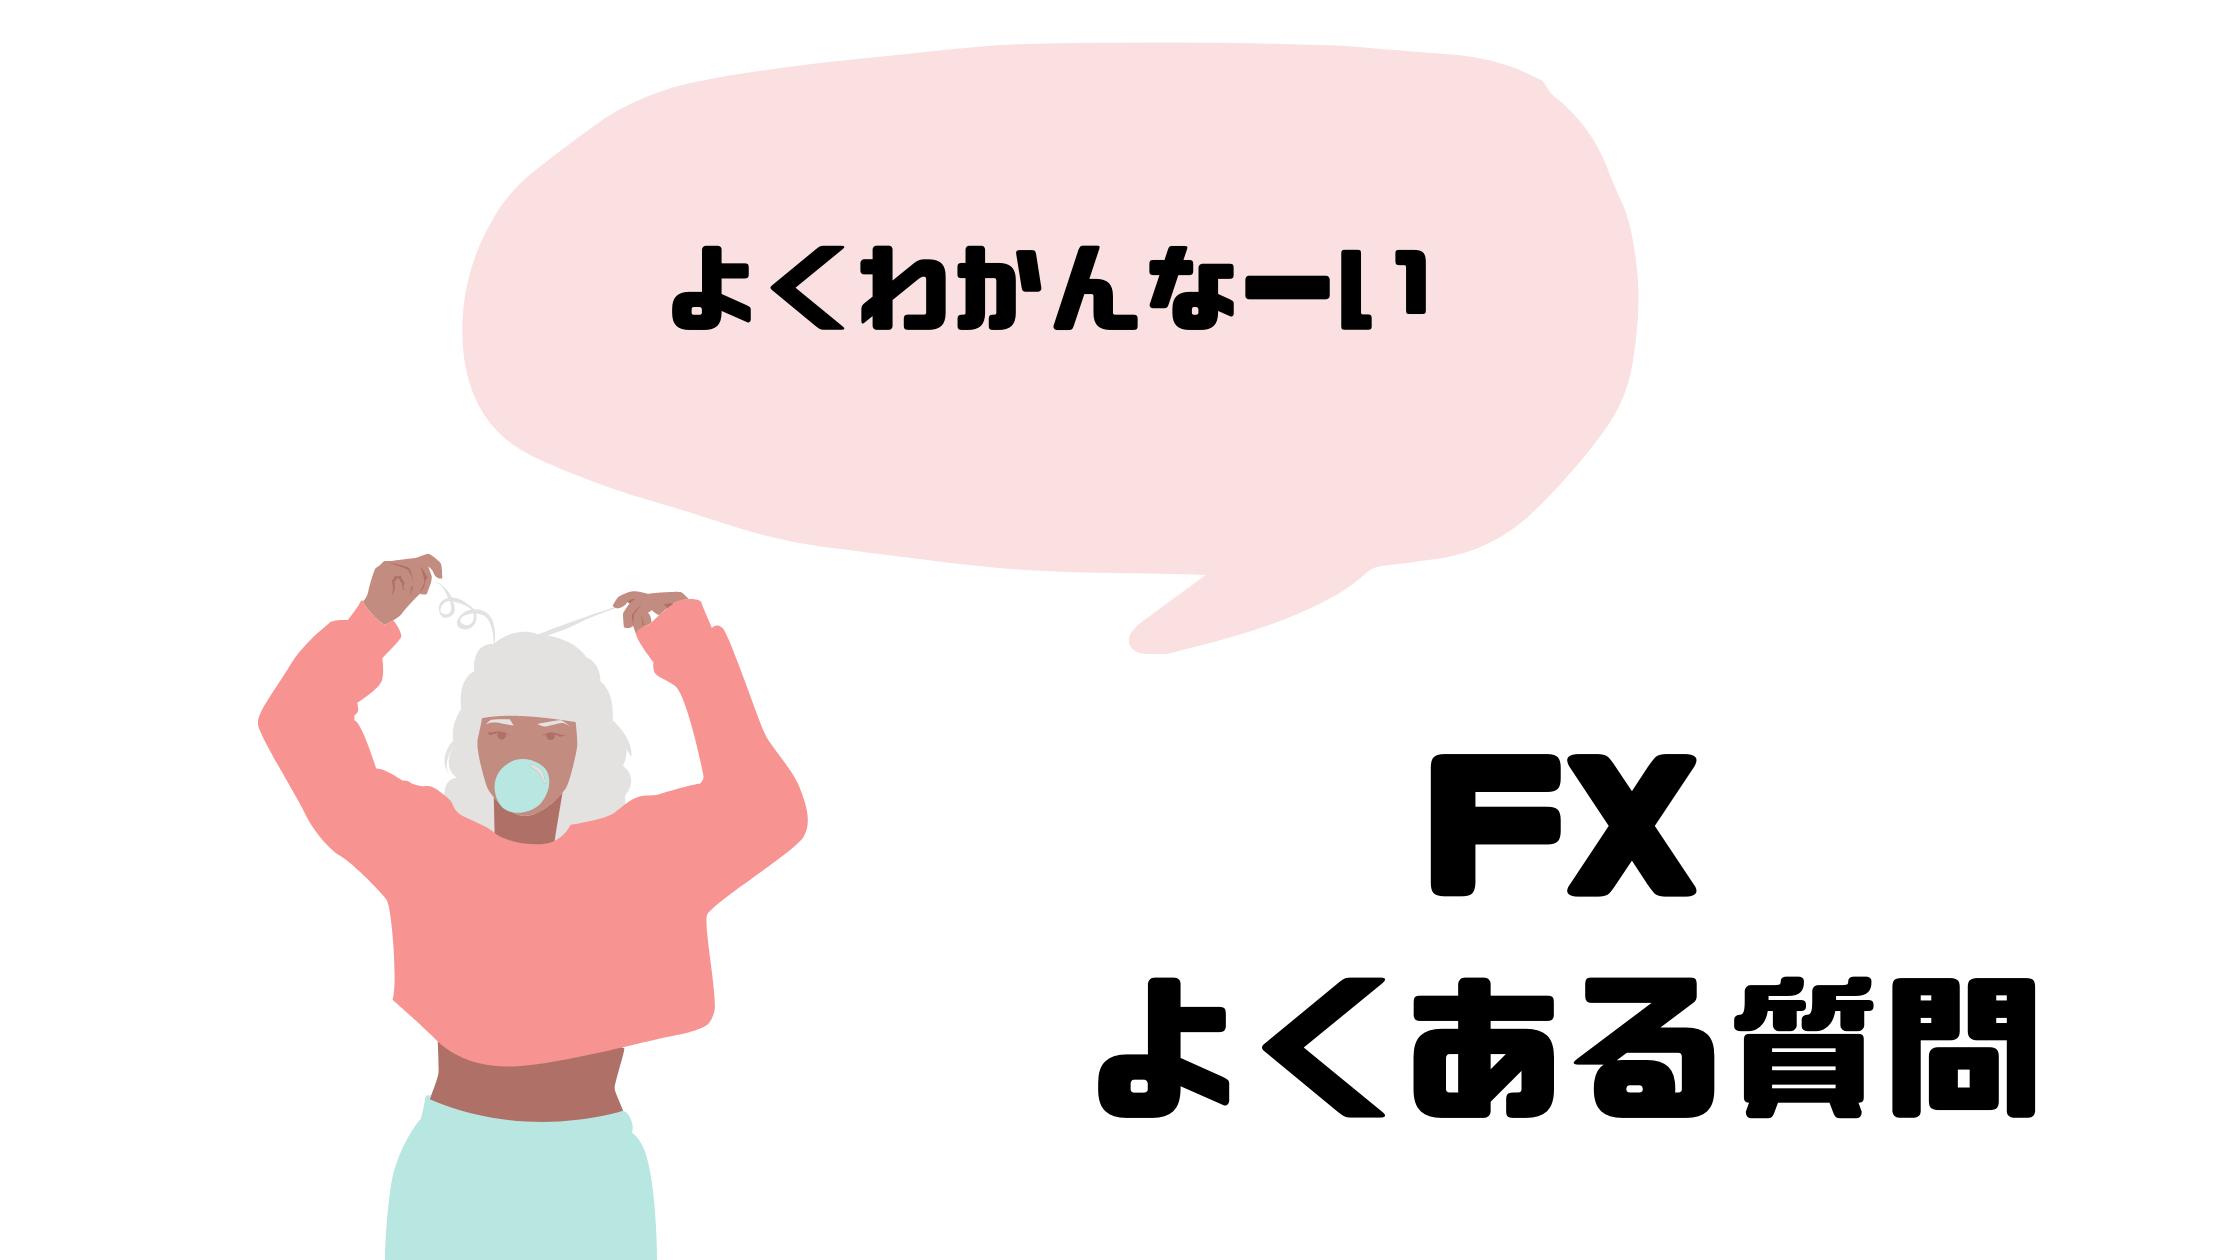 FX_副業_よくある質問